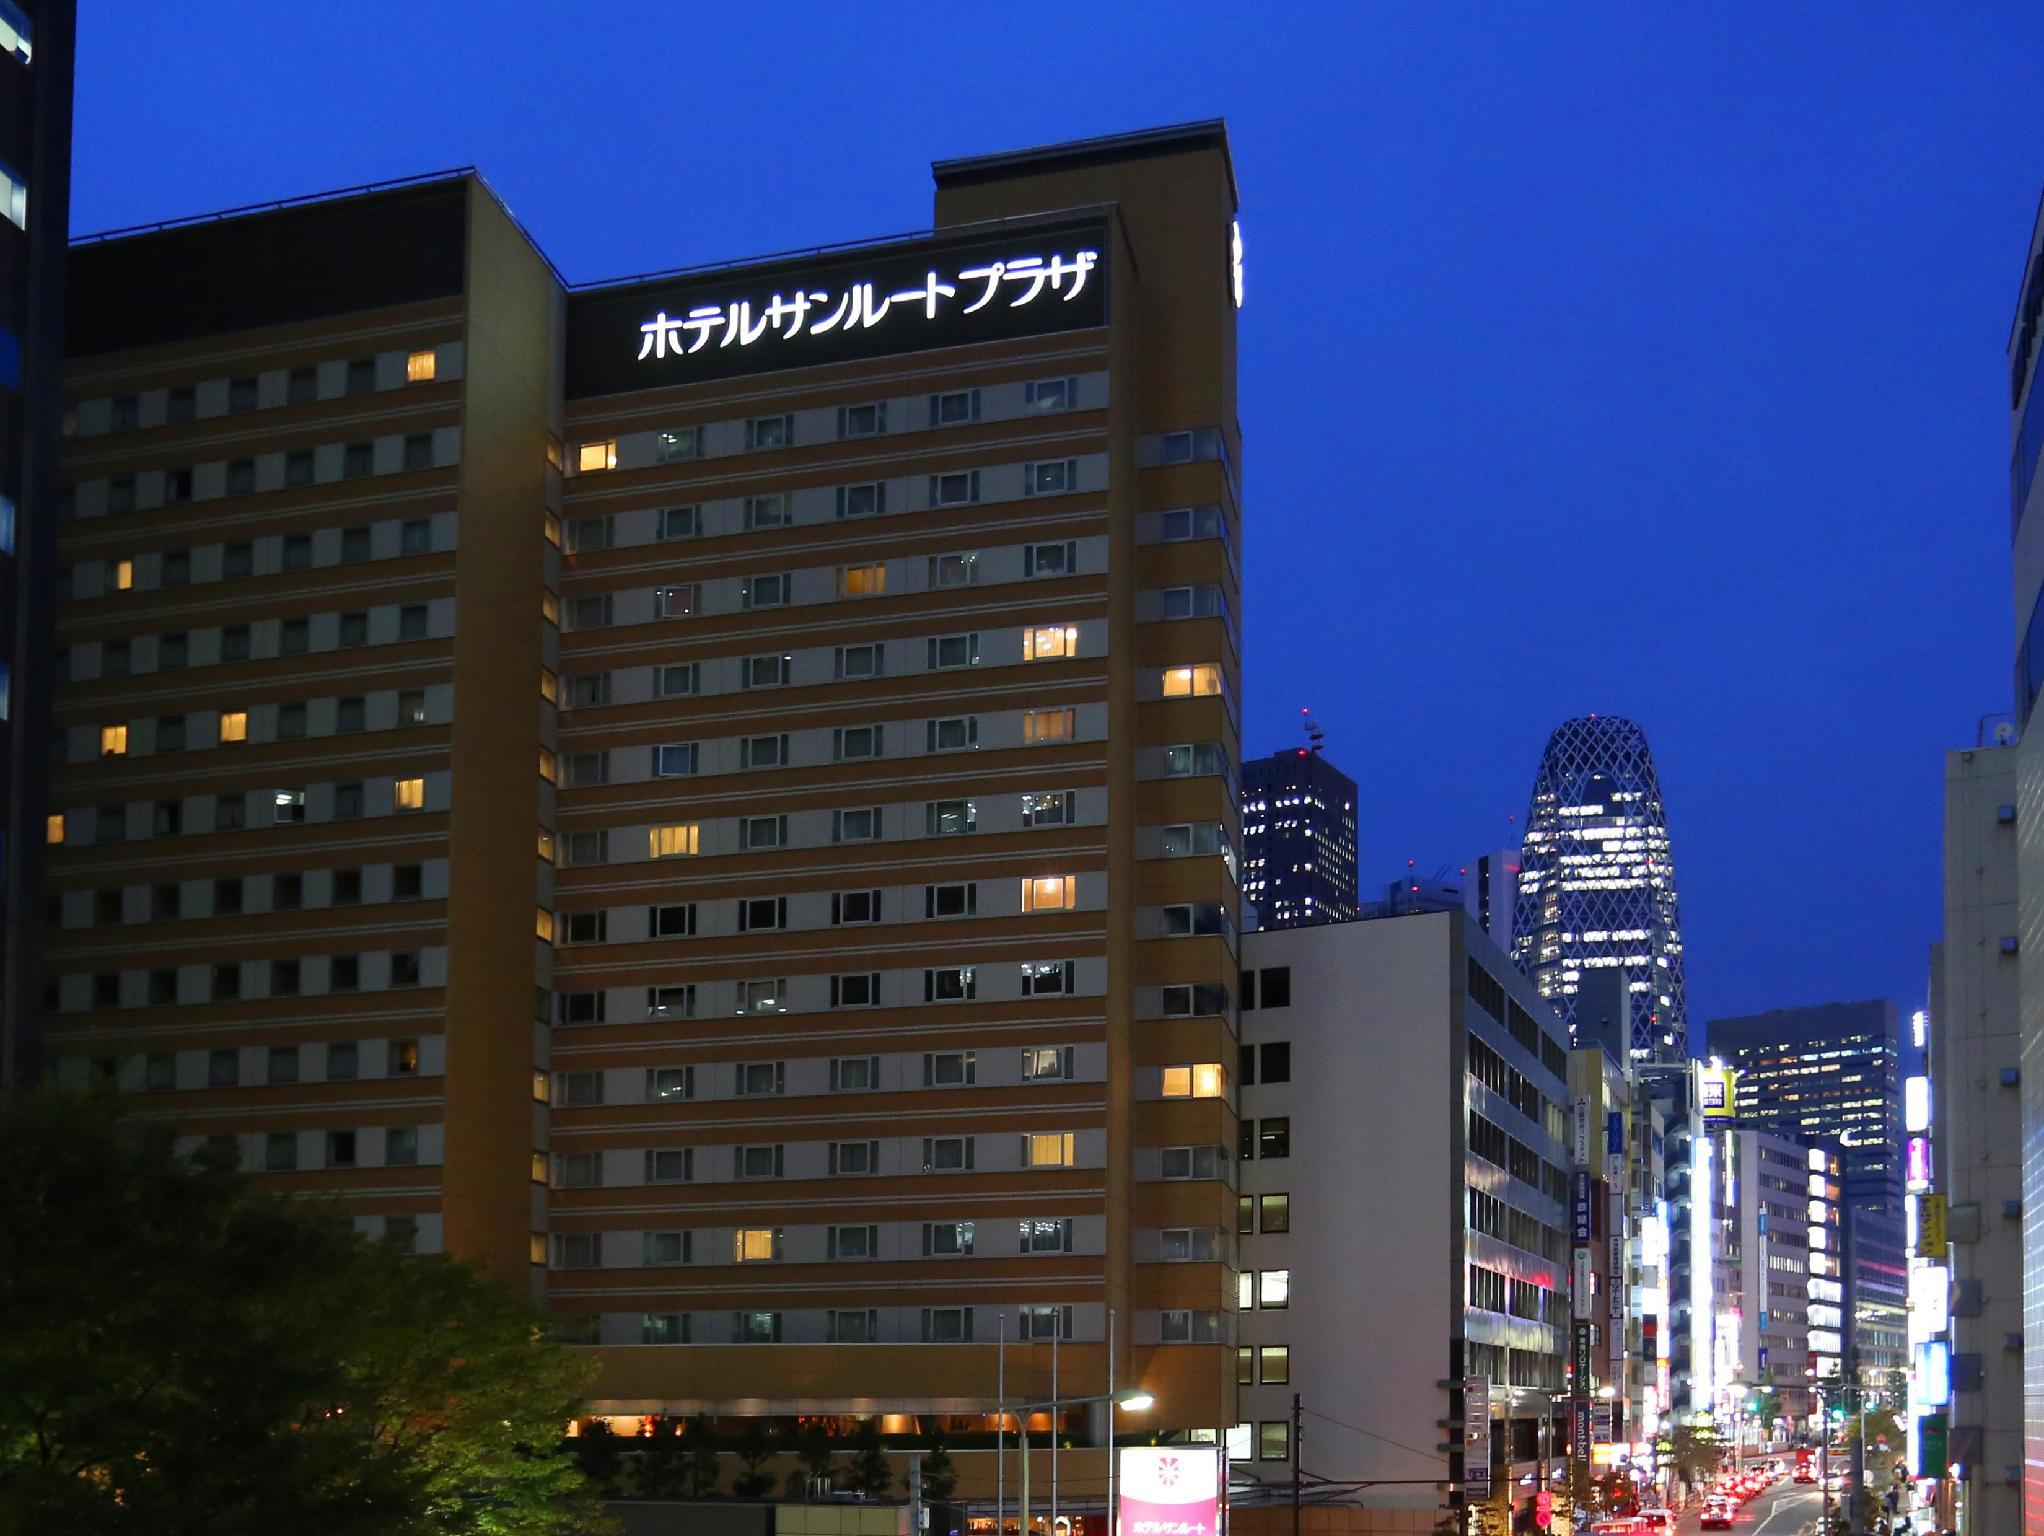 Hotel sunroute plaza shinjuku shinjuku tokyo japan for Hotels japon